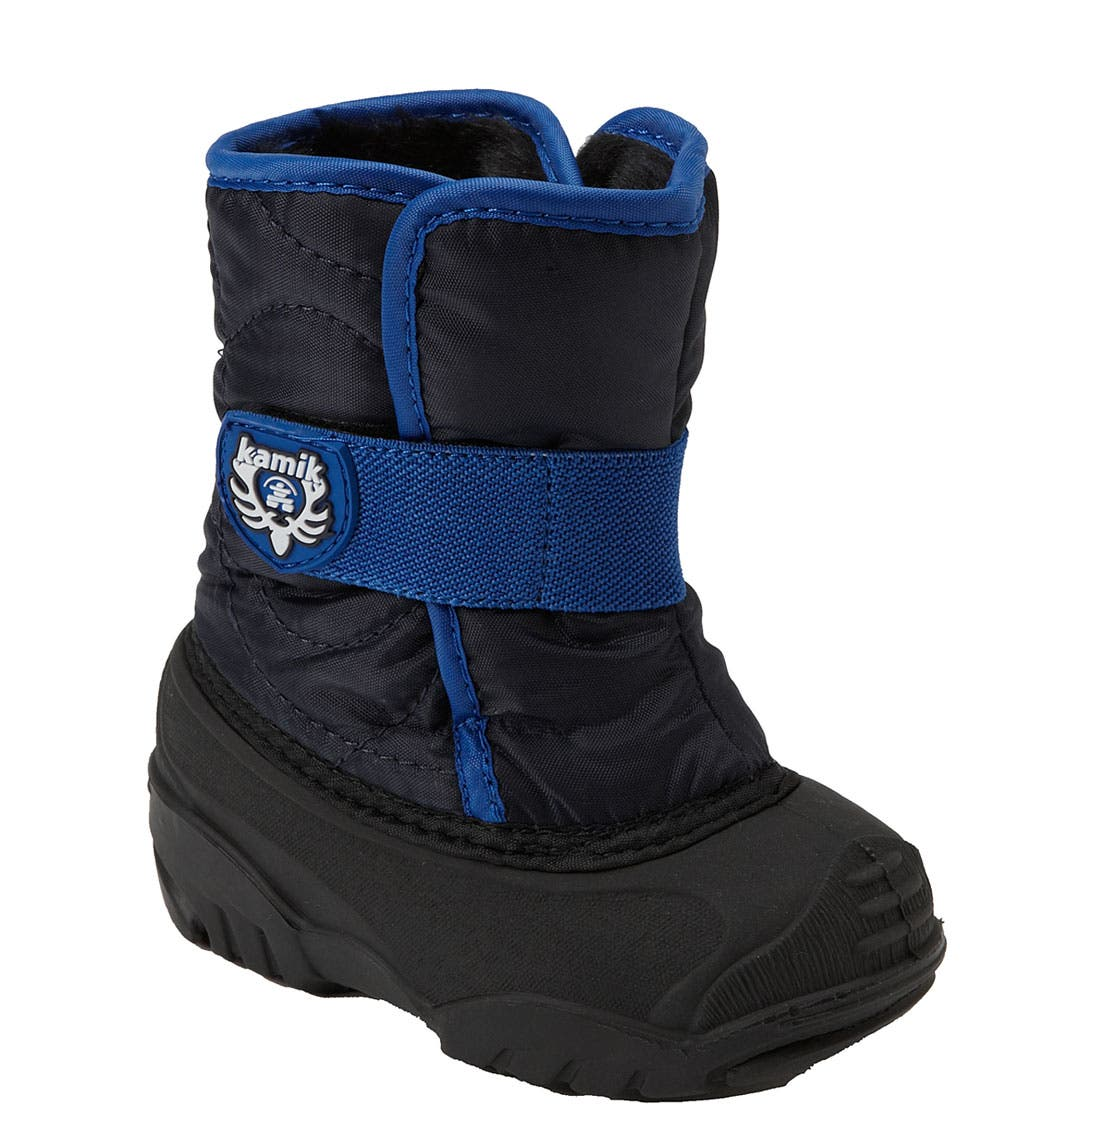 Alternate Image 1 Selected - Kamik 'Snowbug' Waterproof Boot (Walker & Toddler)